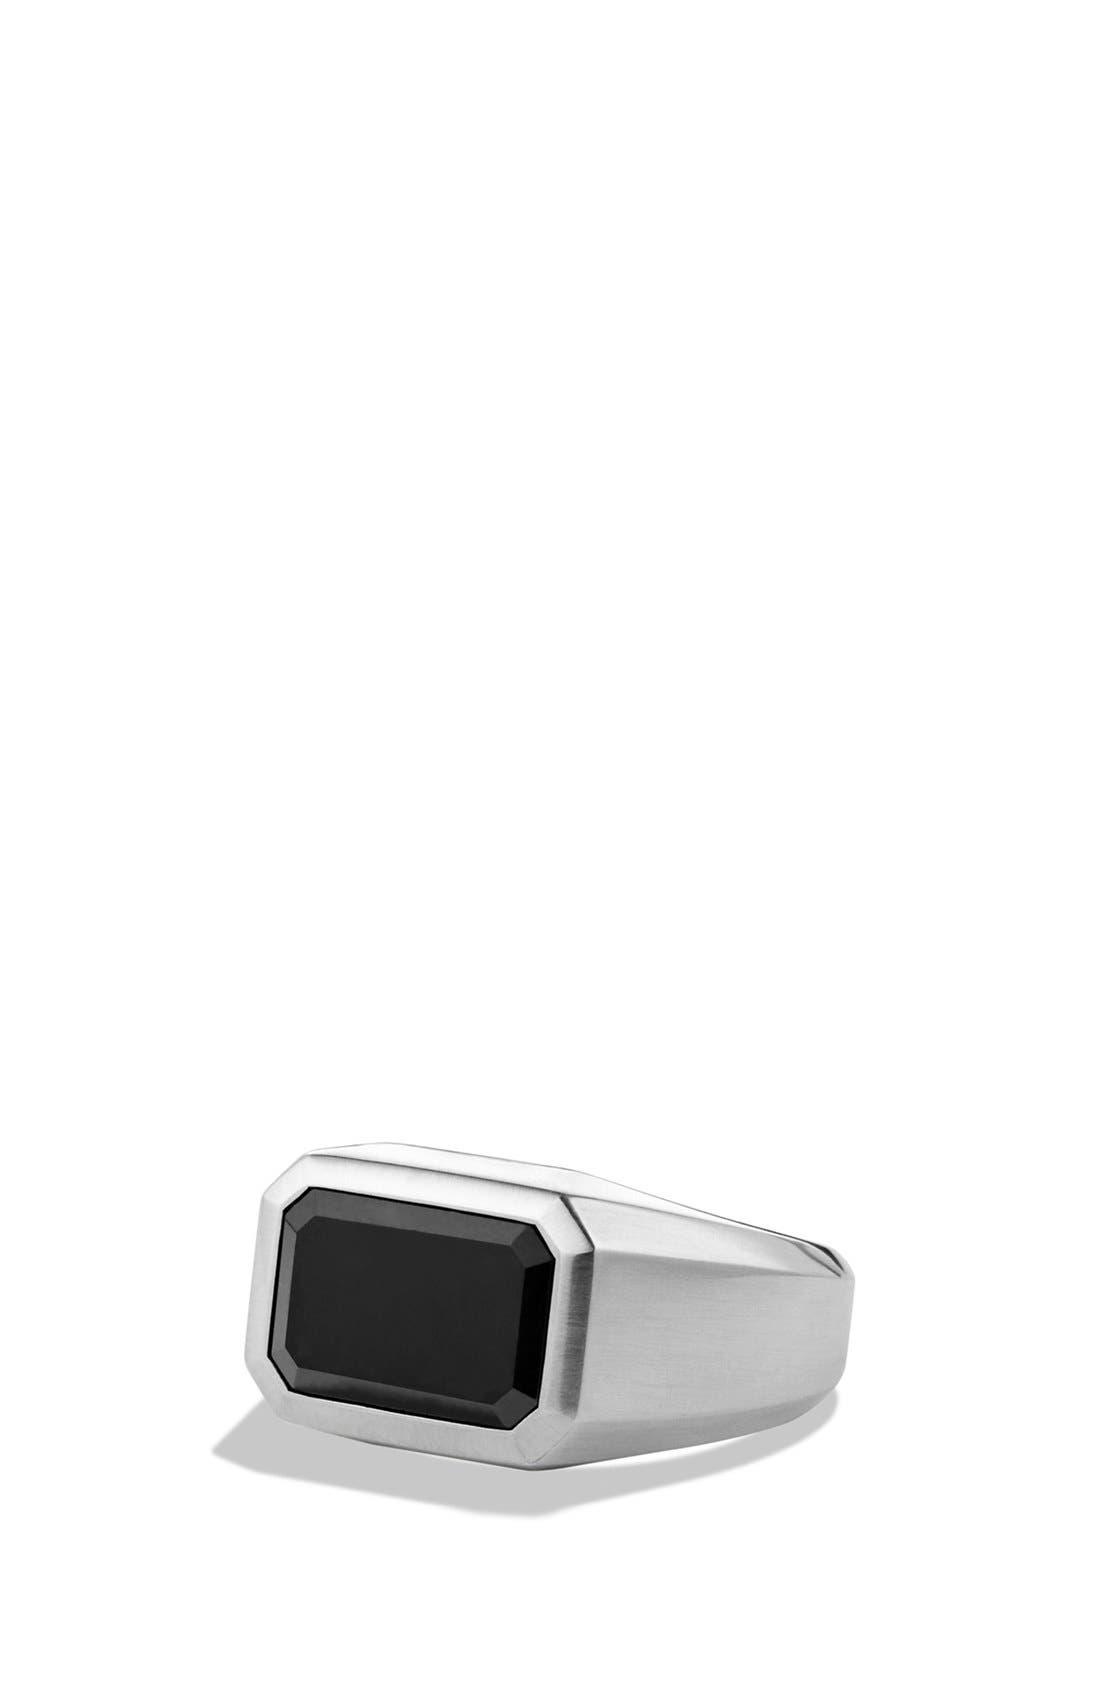 'Exotic Stone' Signet Ring with Semiprecious Stone,                         Main,                         color, Black Jade